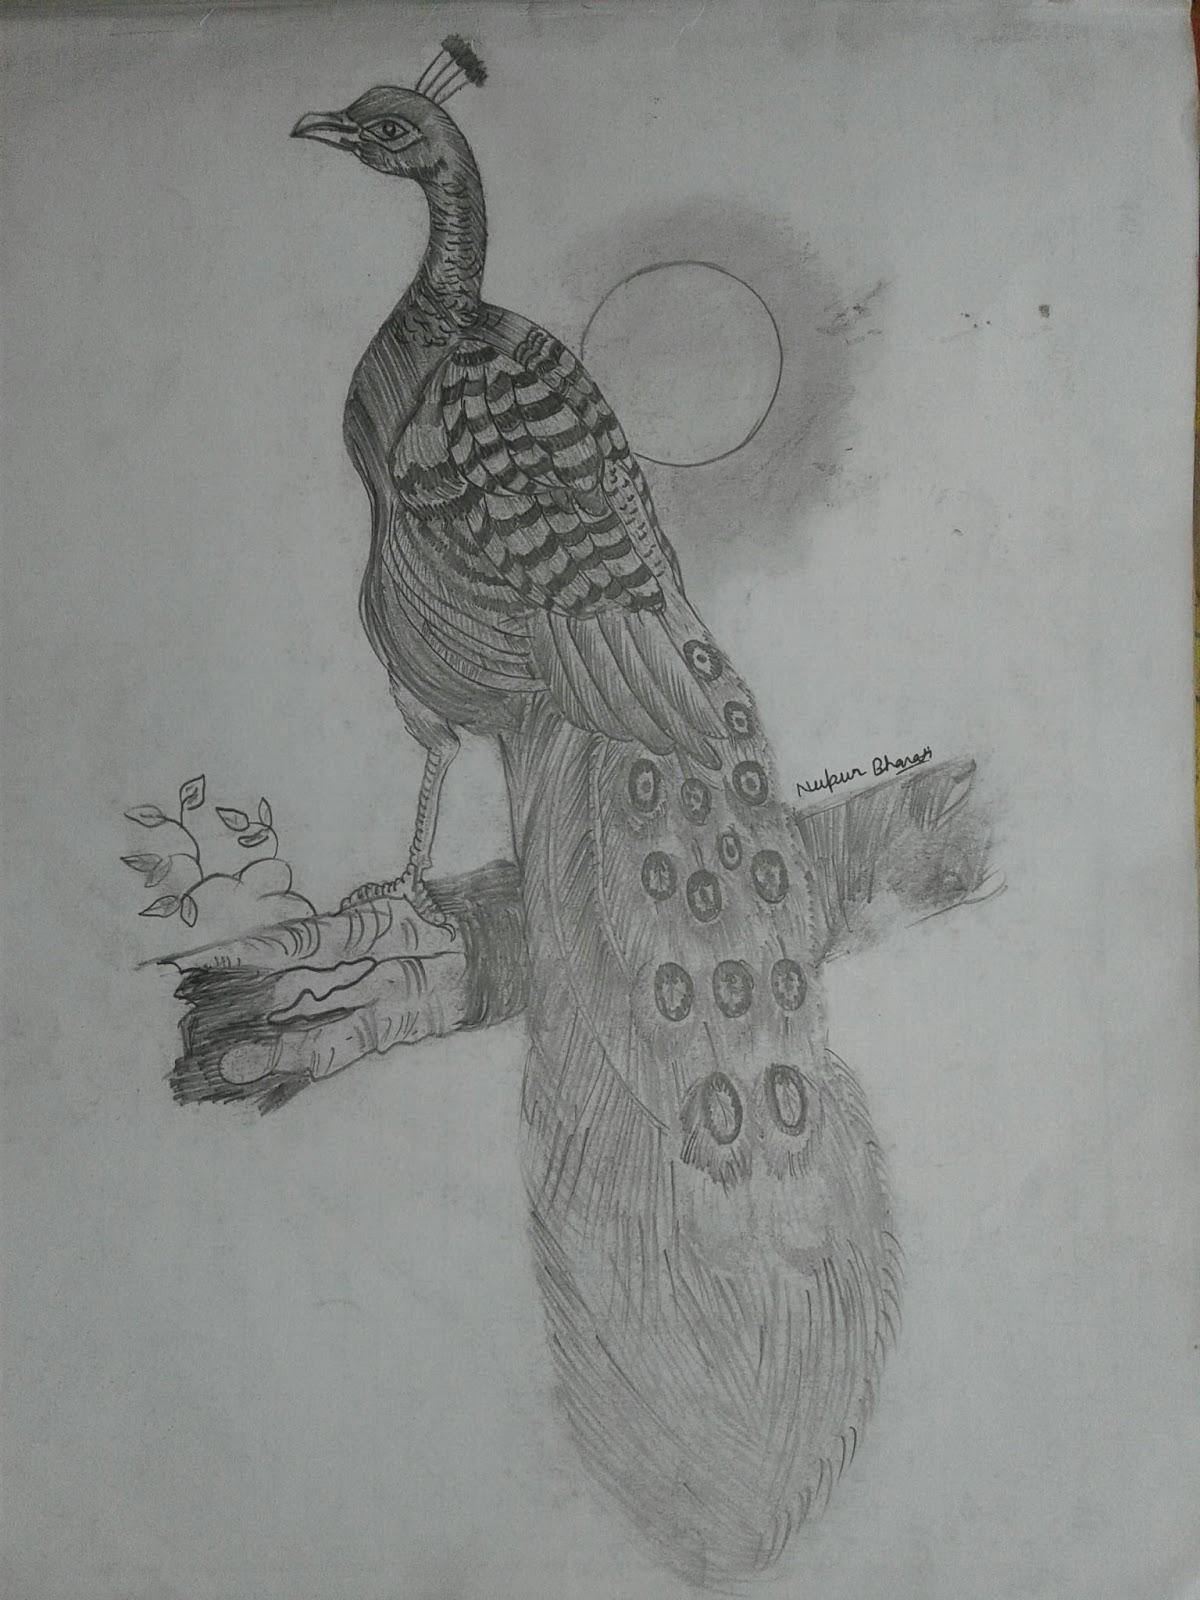 Sketching of peacock